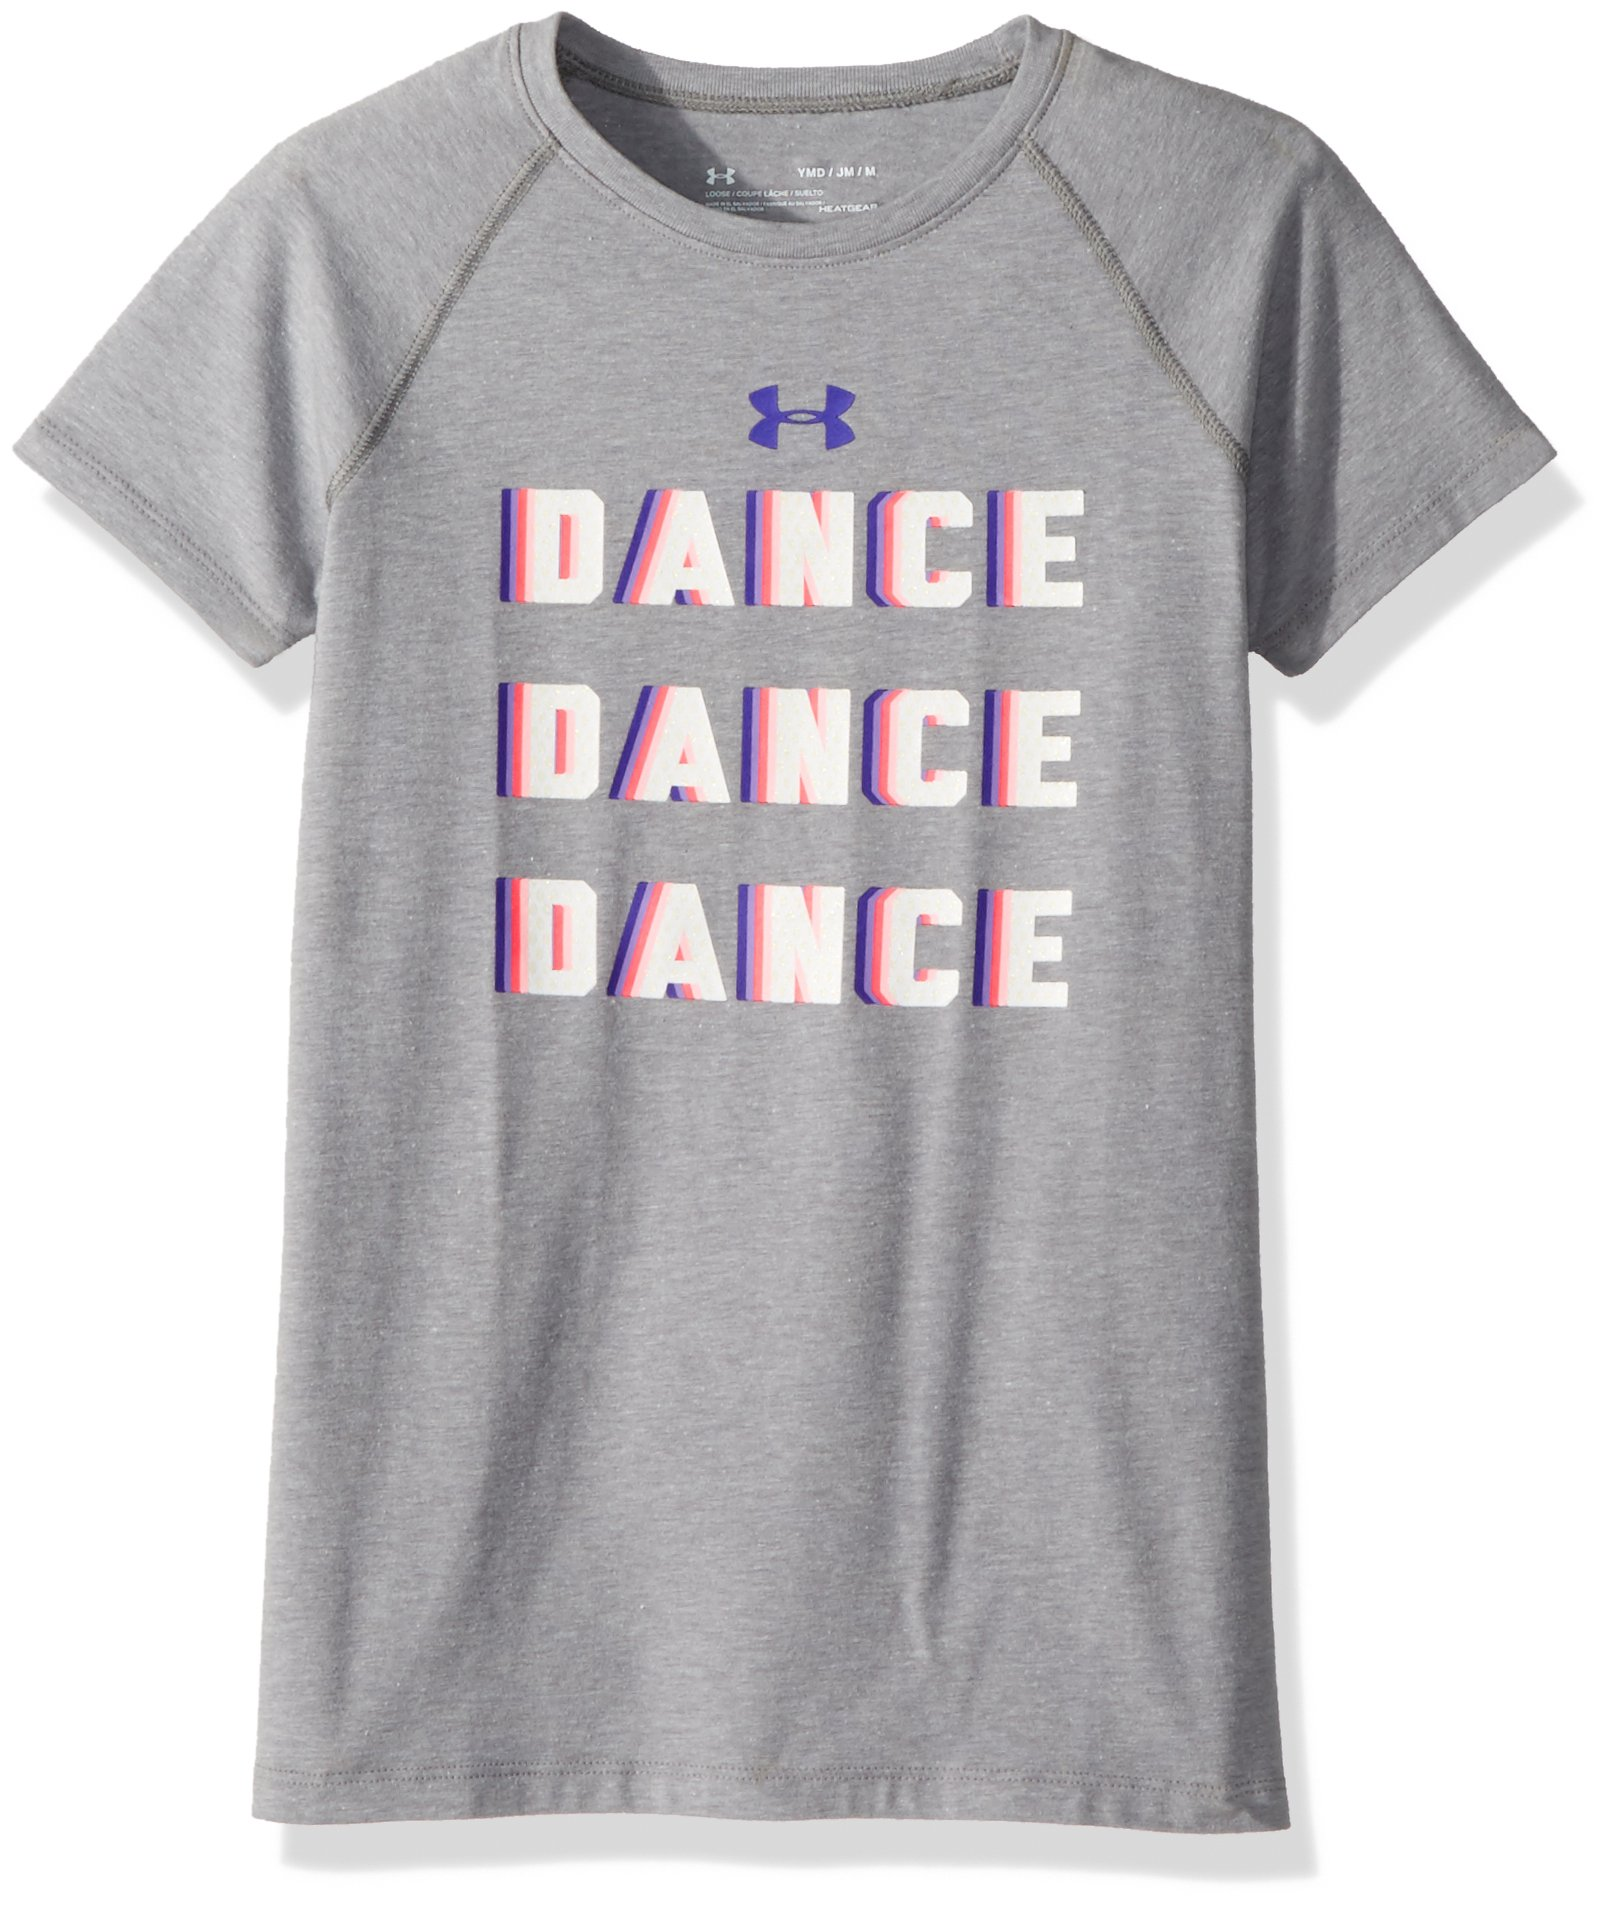 Under Armour Girls' Dance Dance T-Shirt, Steel Light Heather (035), Youth Medium